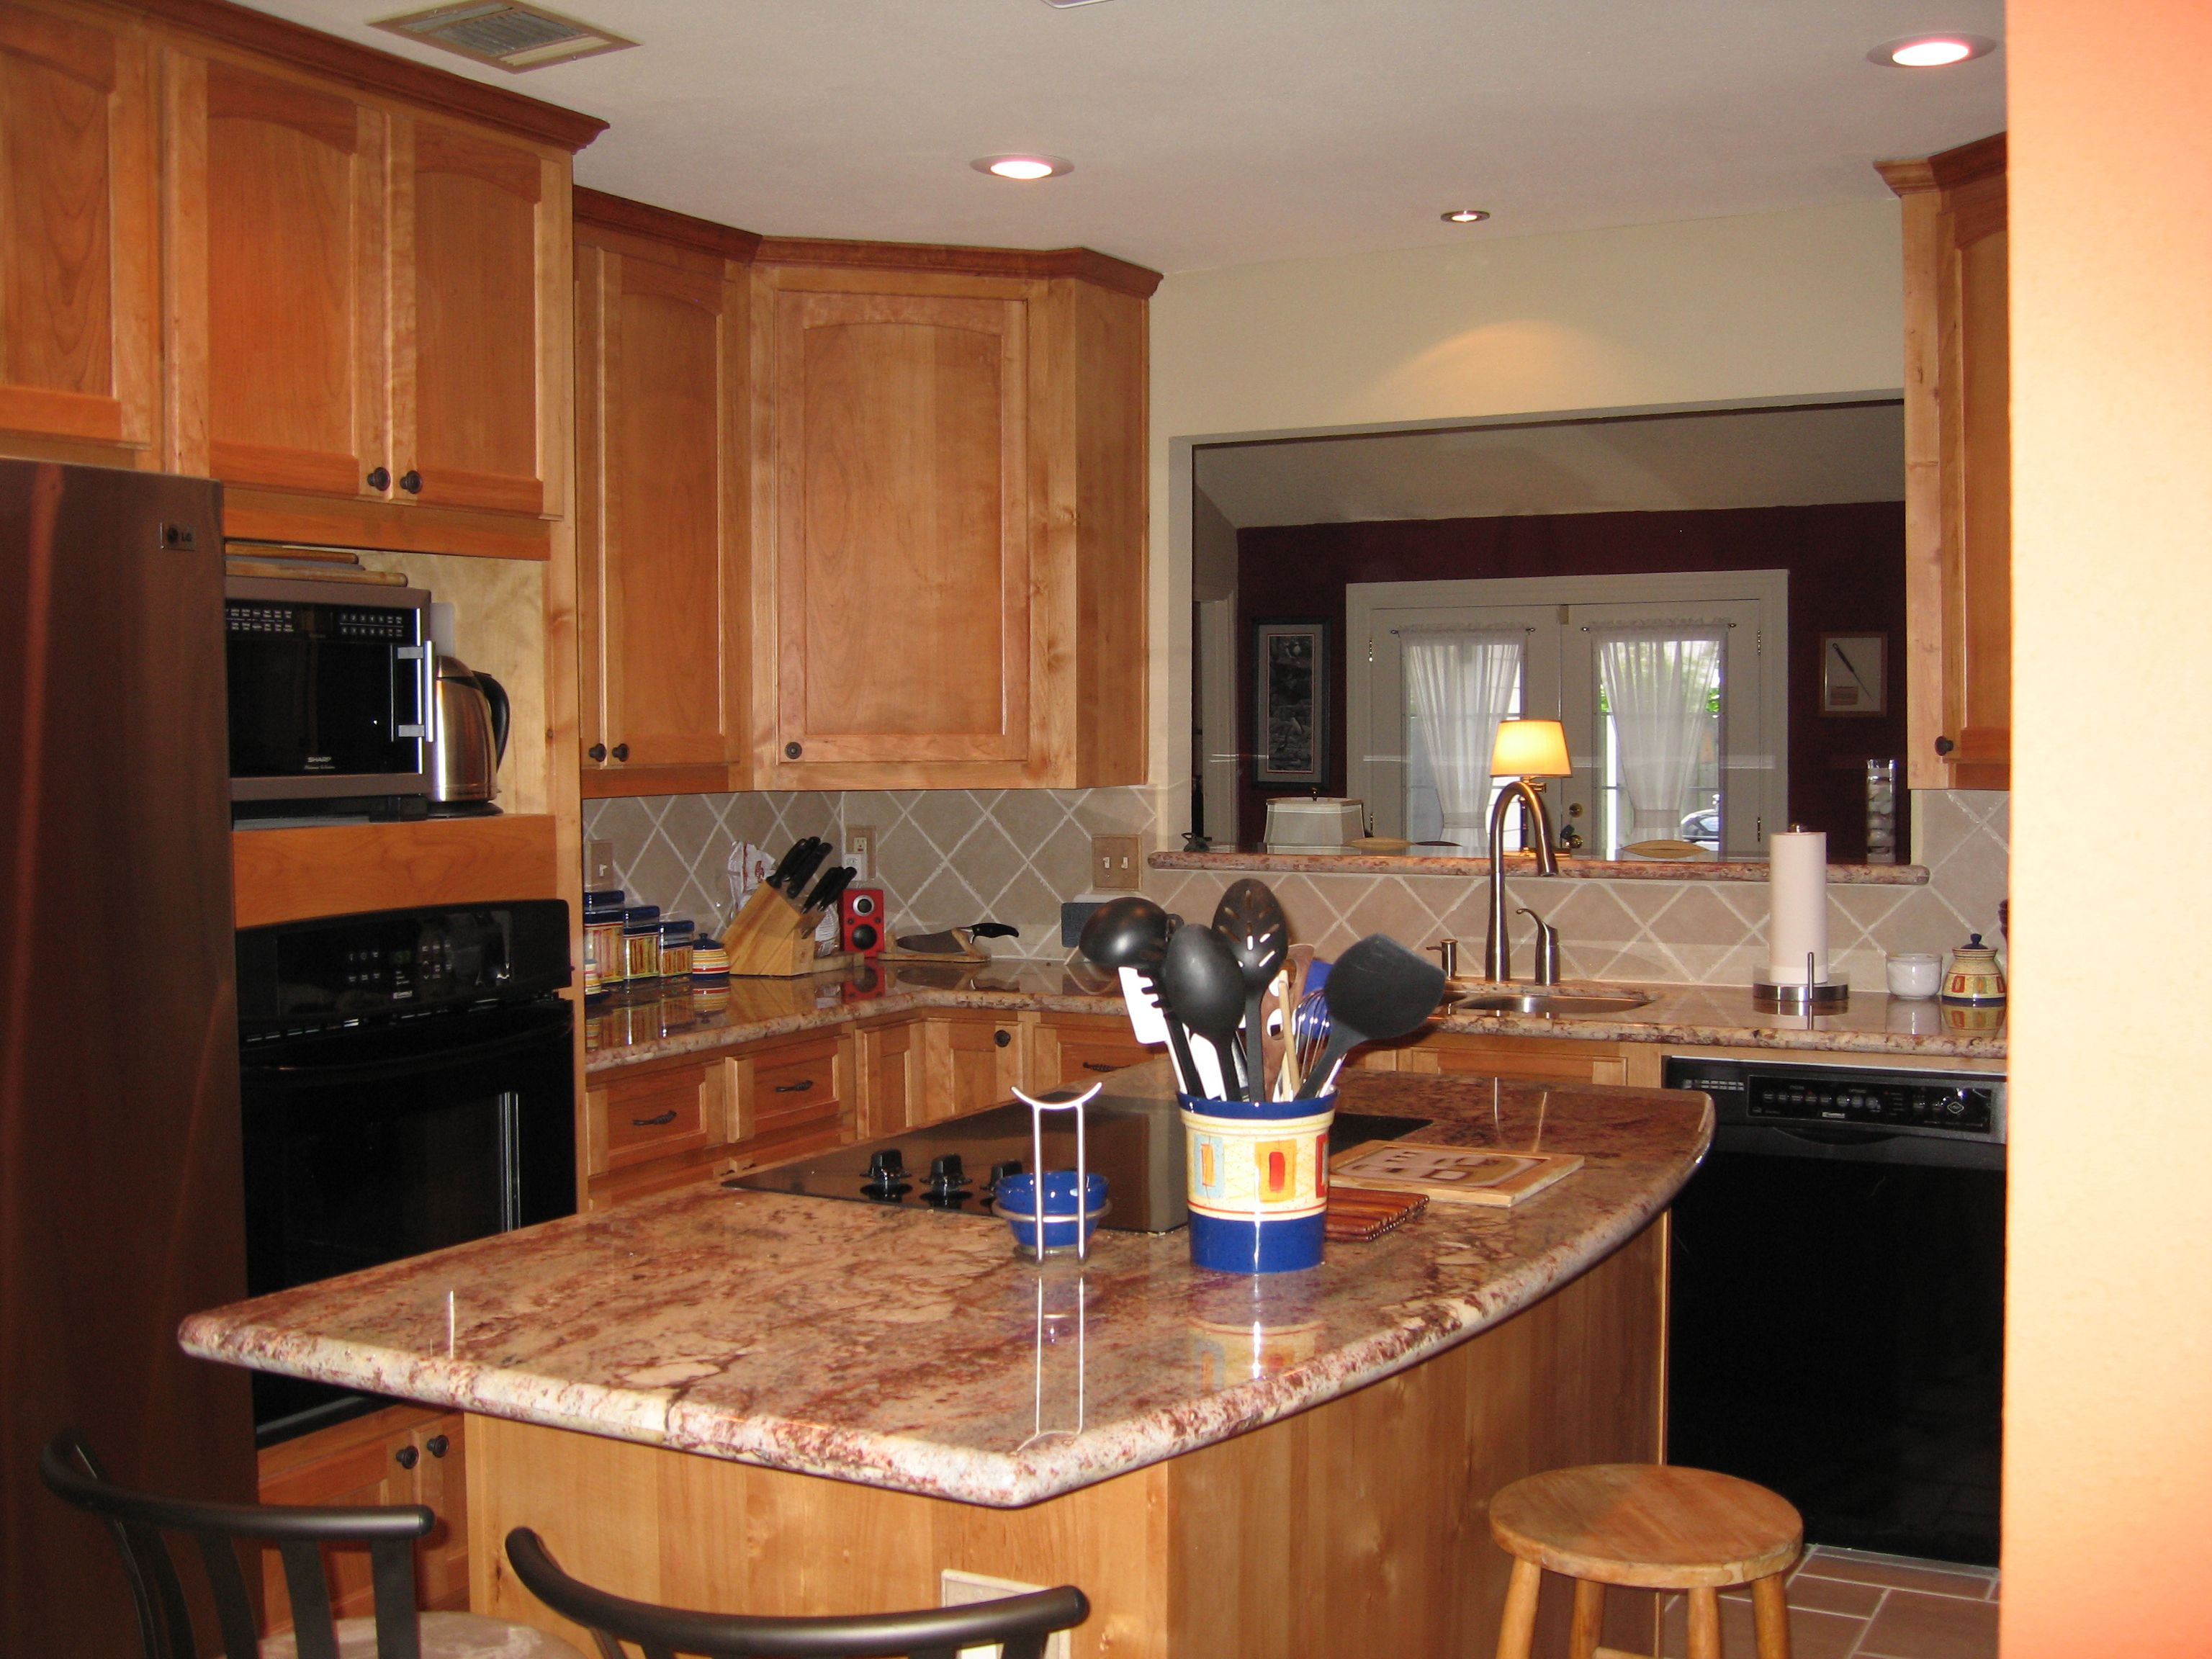 Lapidus premium product search marva marble and granite - Typhoon Bordeaux Granite Countertops Google Search Lake House Counters Backsplash Pinterest Granite Granite Countertops And Countertops